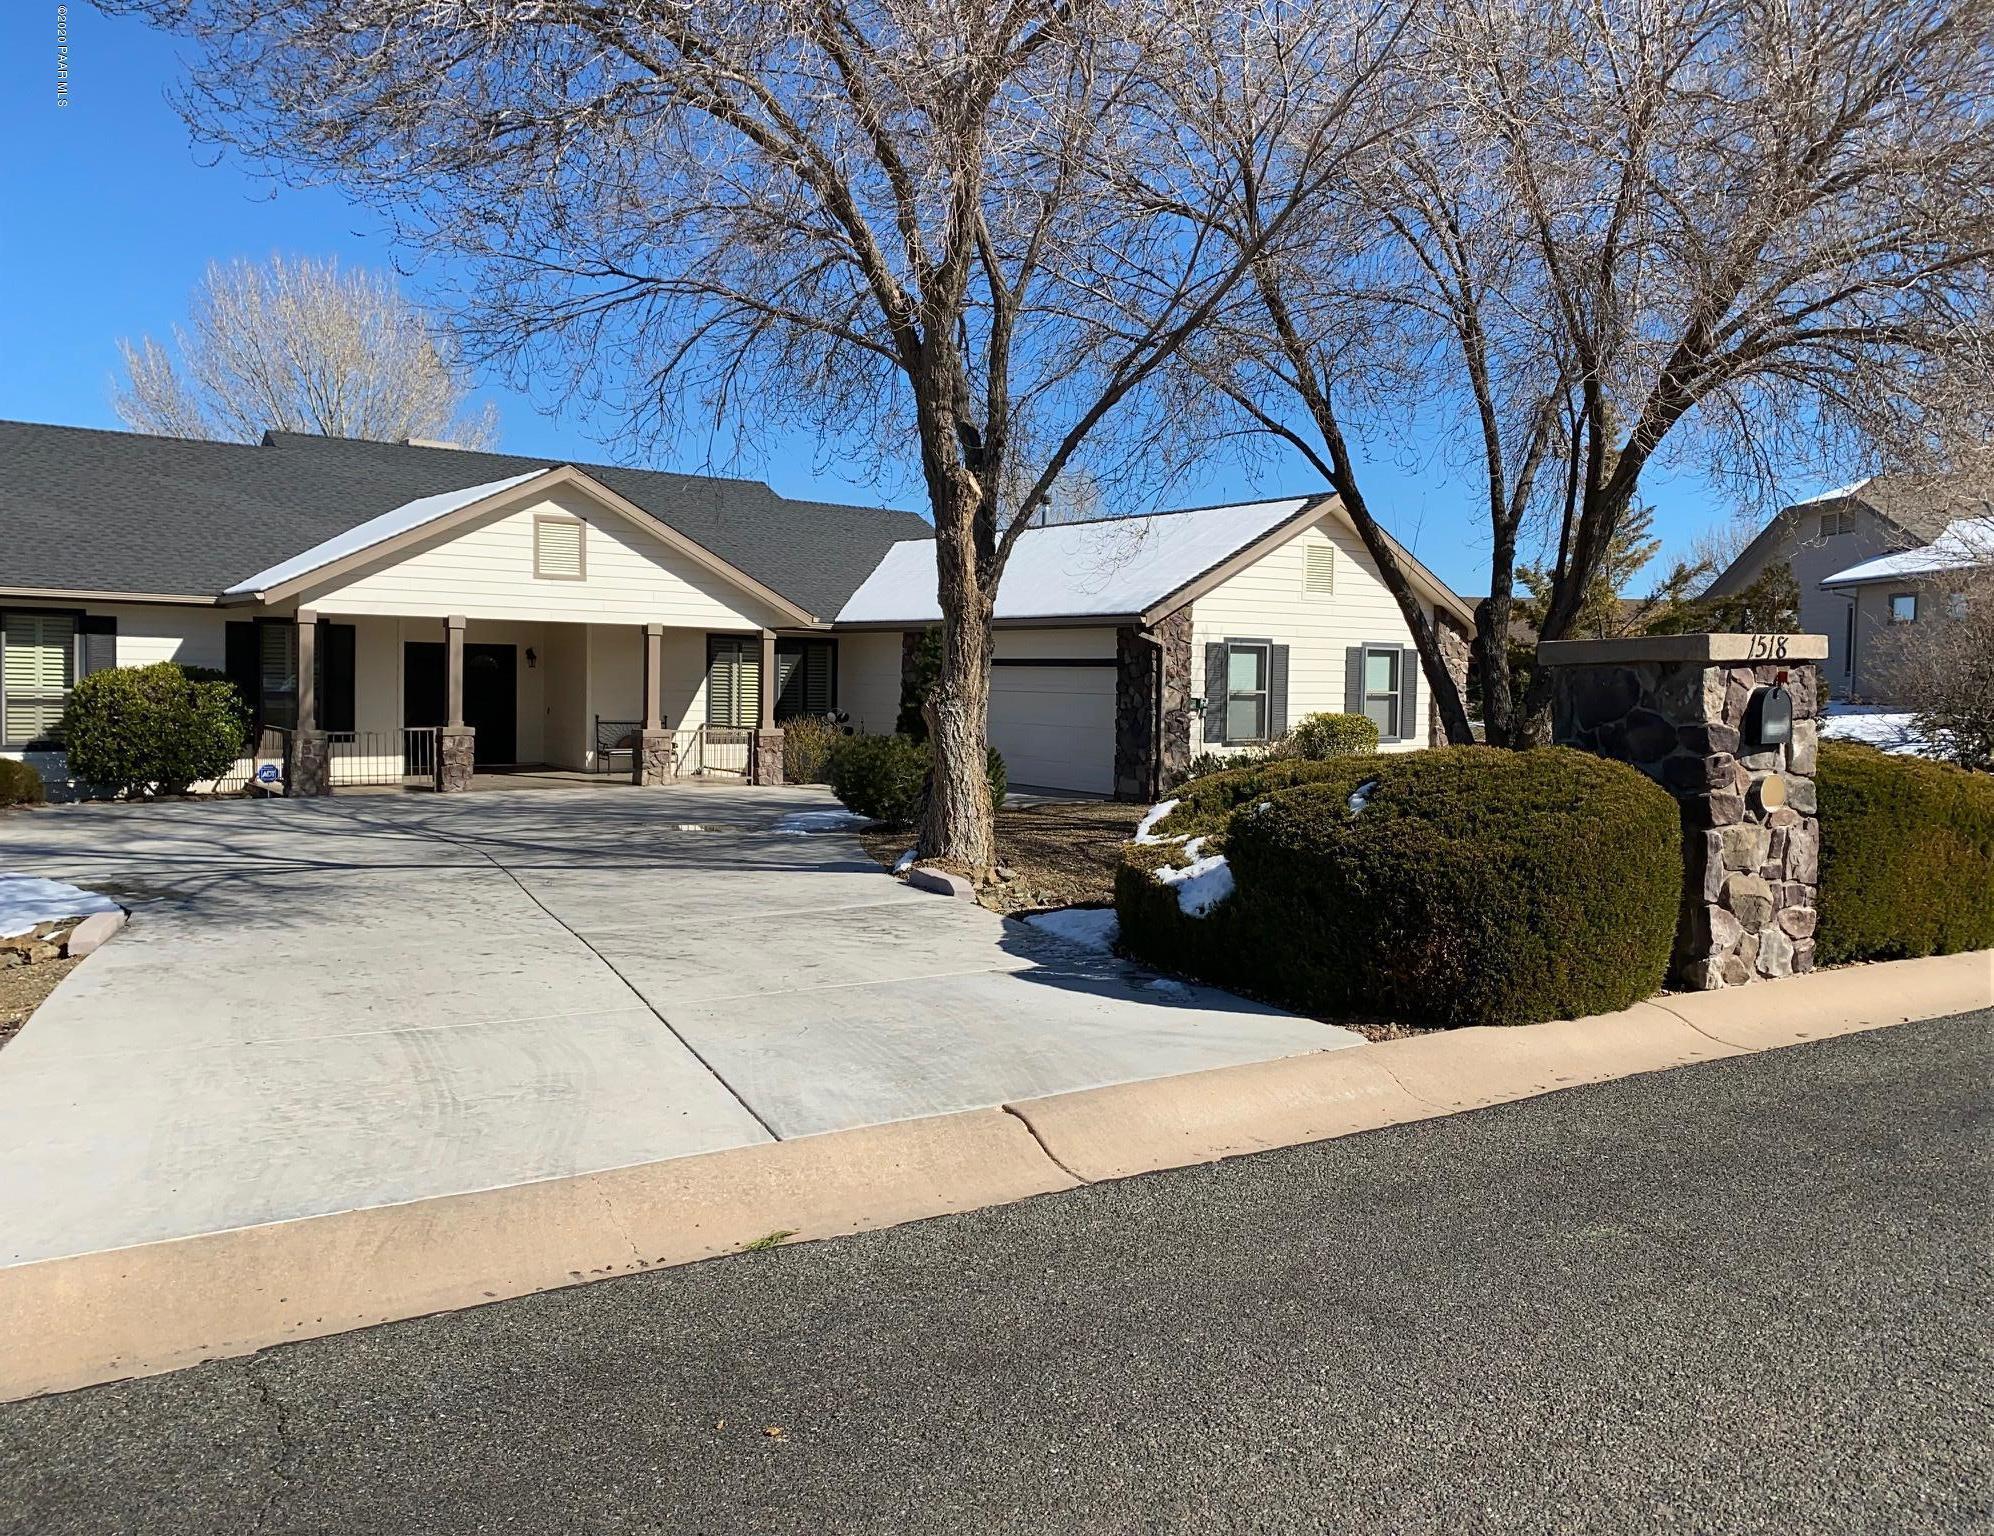 1518  Gettysvue Way, Prescott in Yavapai County, AZ 86301 Home for Sale